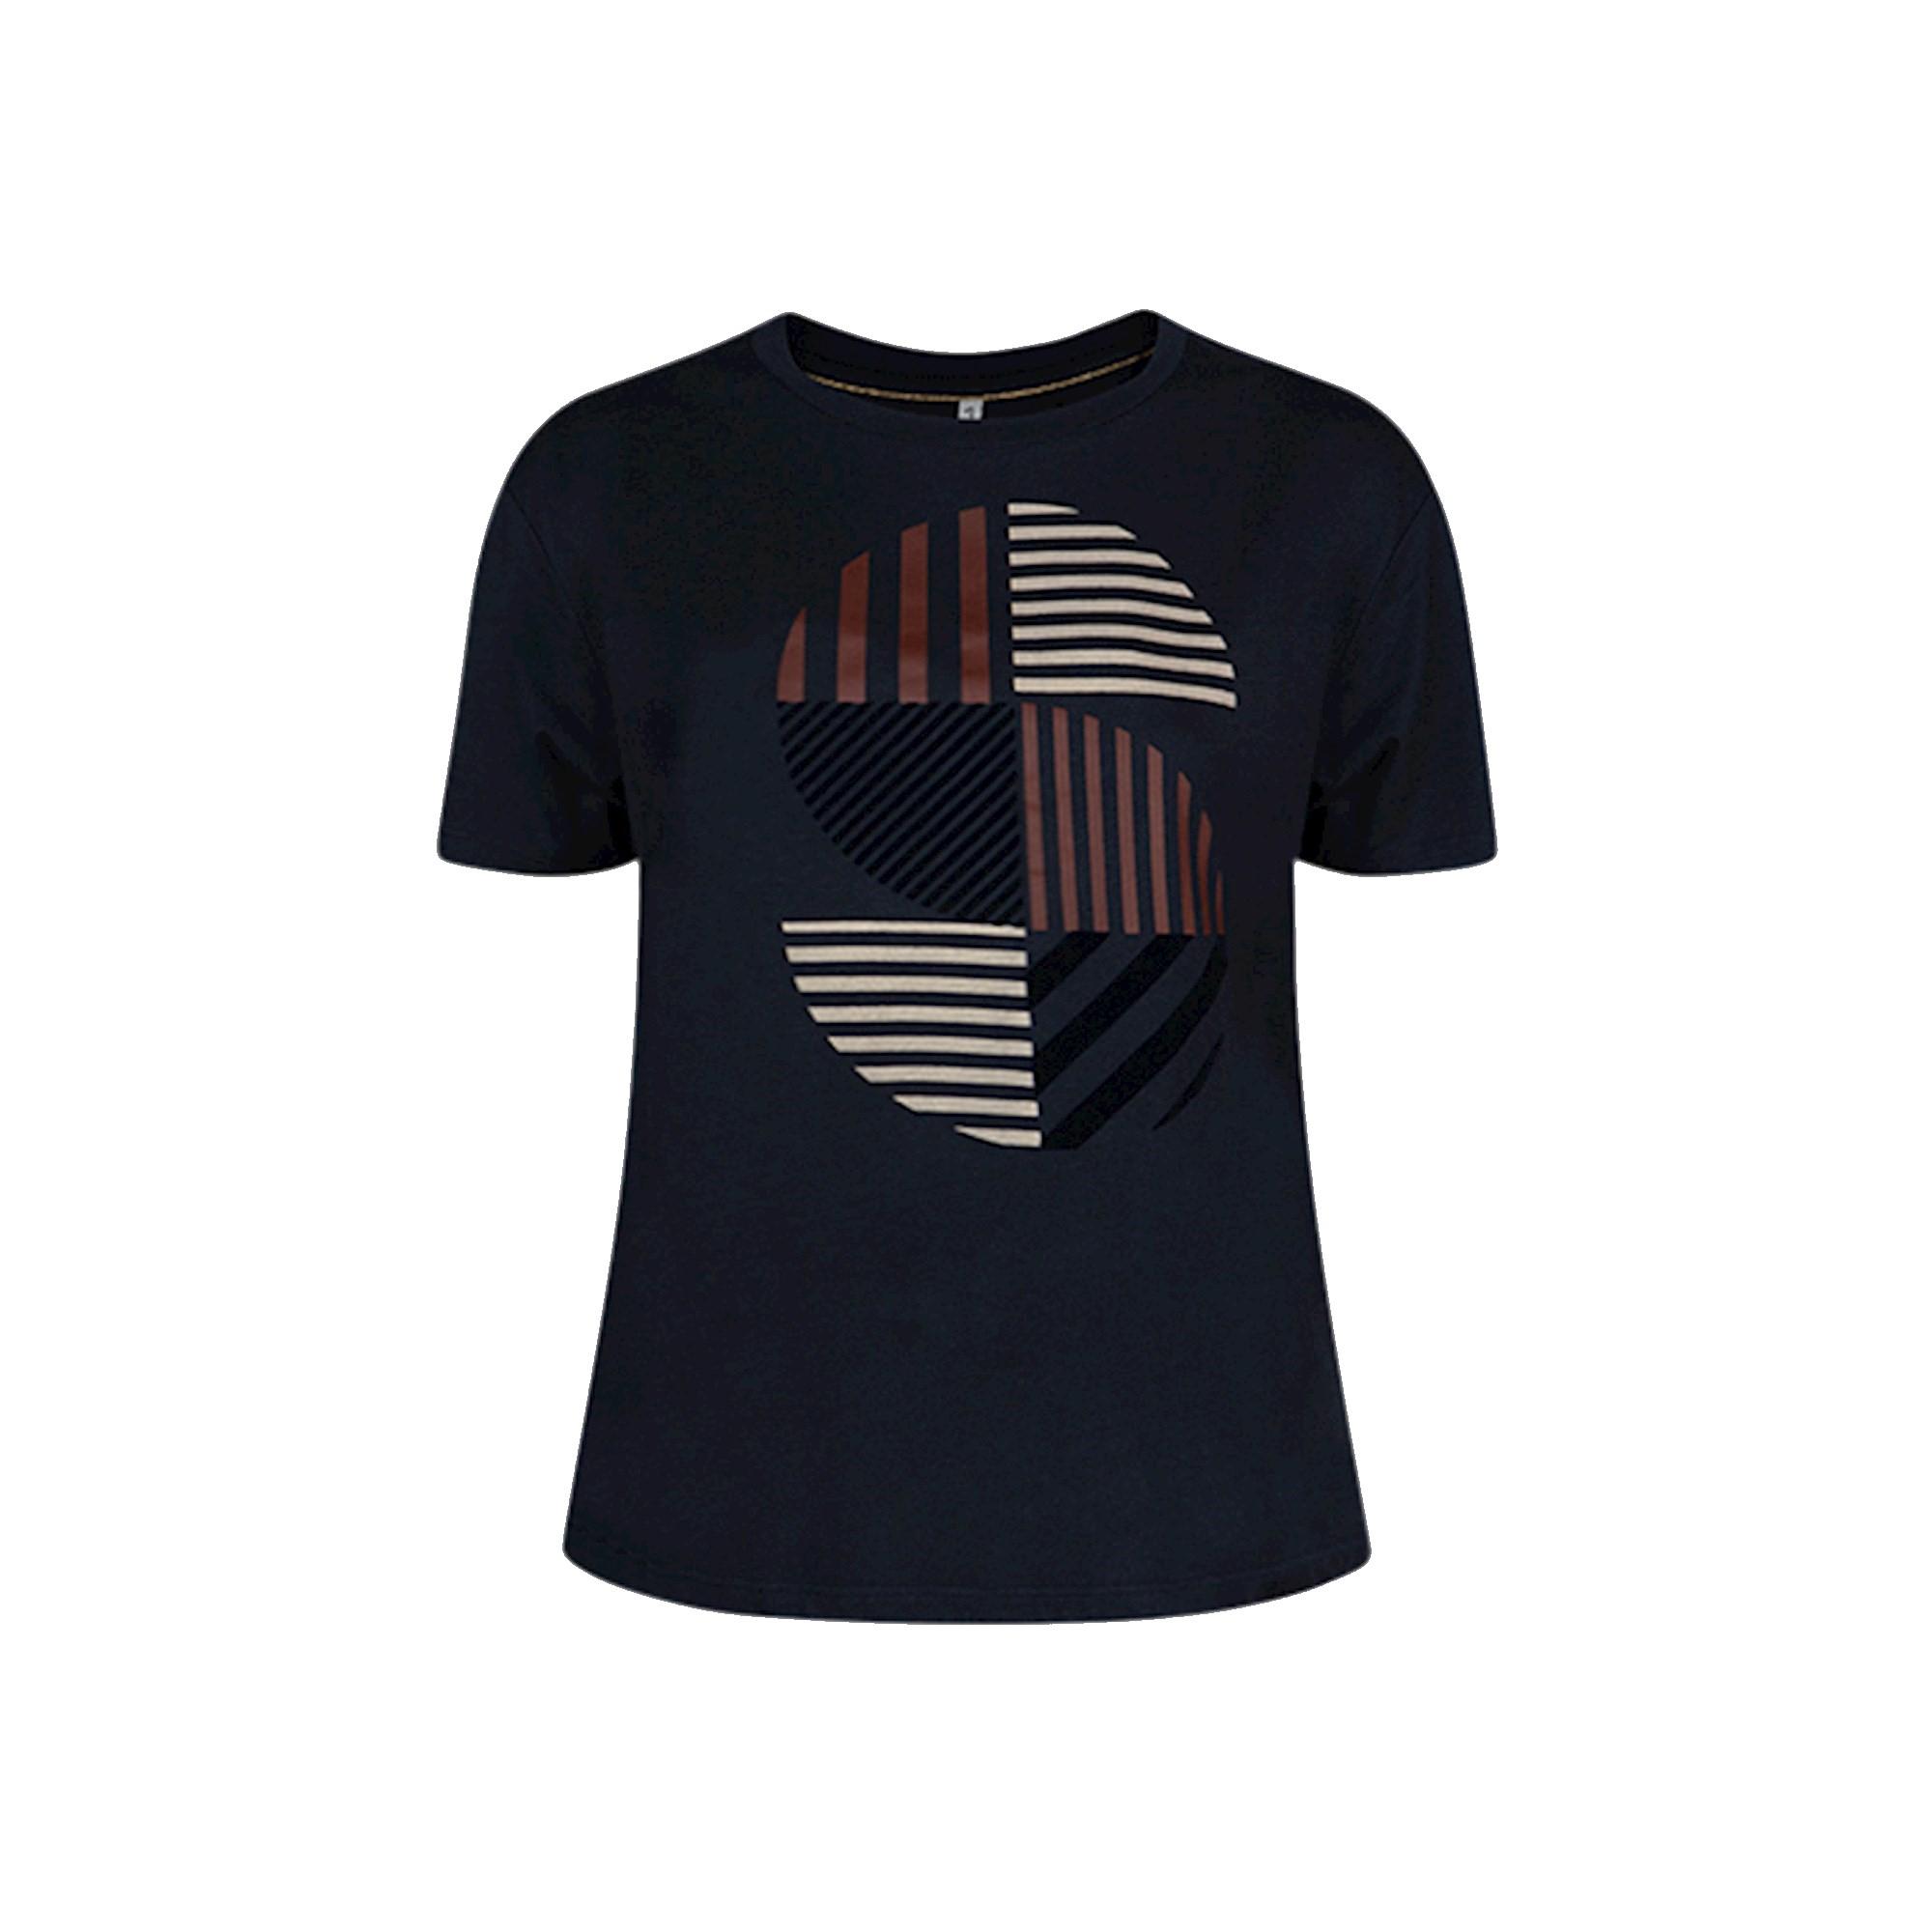 Donkerblauw dames t-shirt Summum - 3S4586-000496 navy